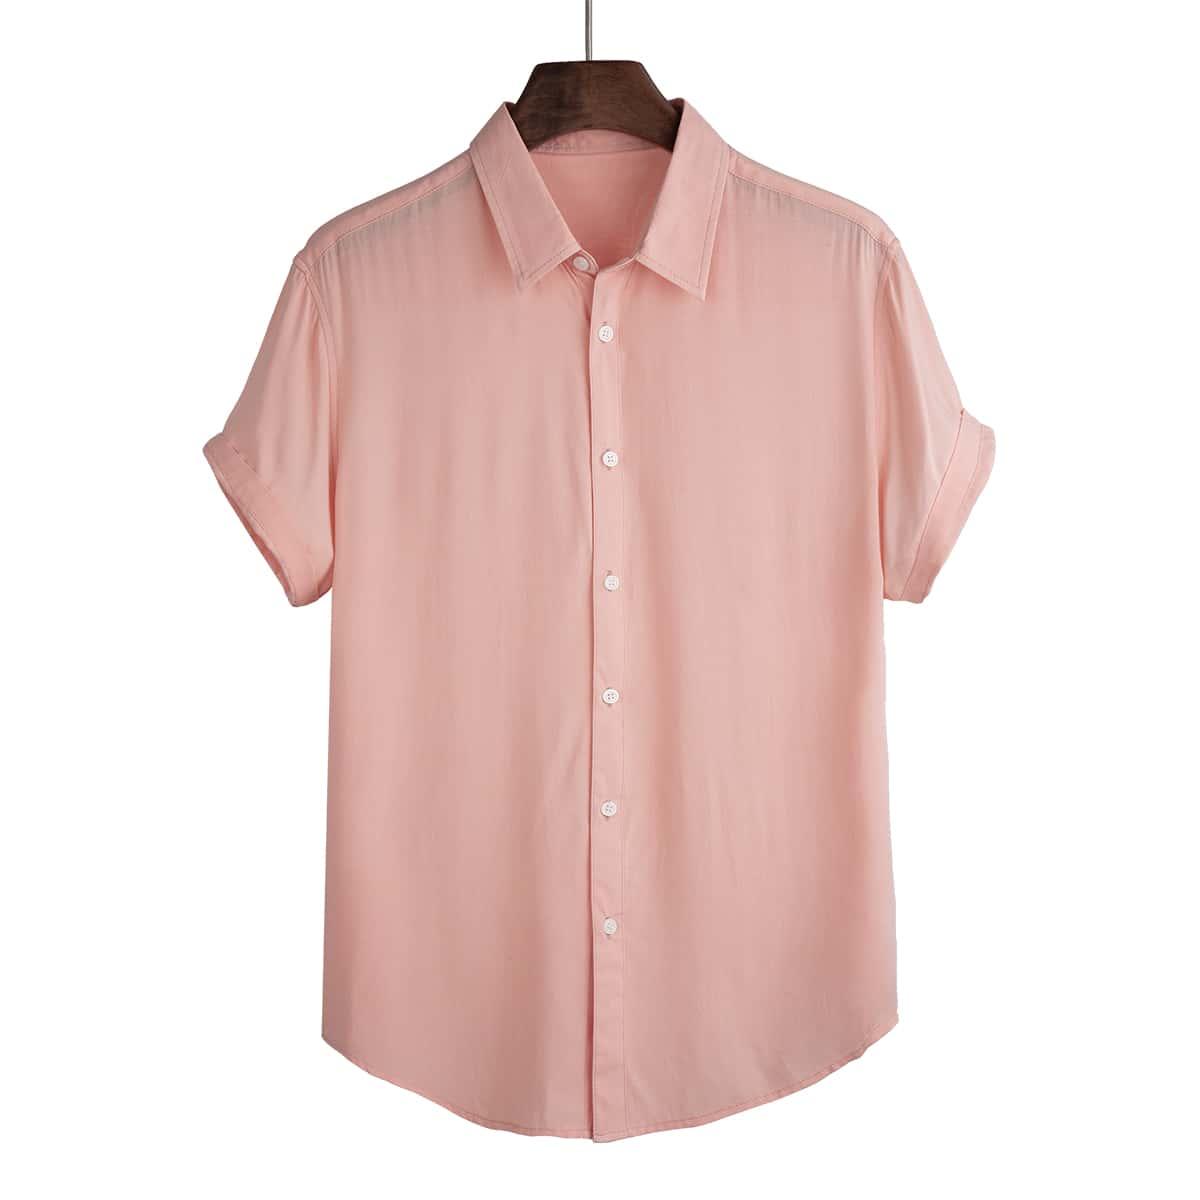 Мужская асимметричная рубашка на пуговицах SheIn smshirt25210507554